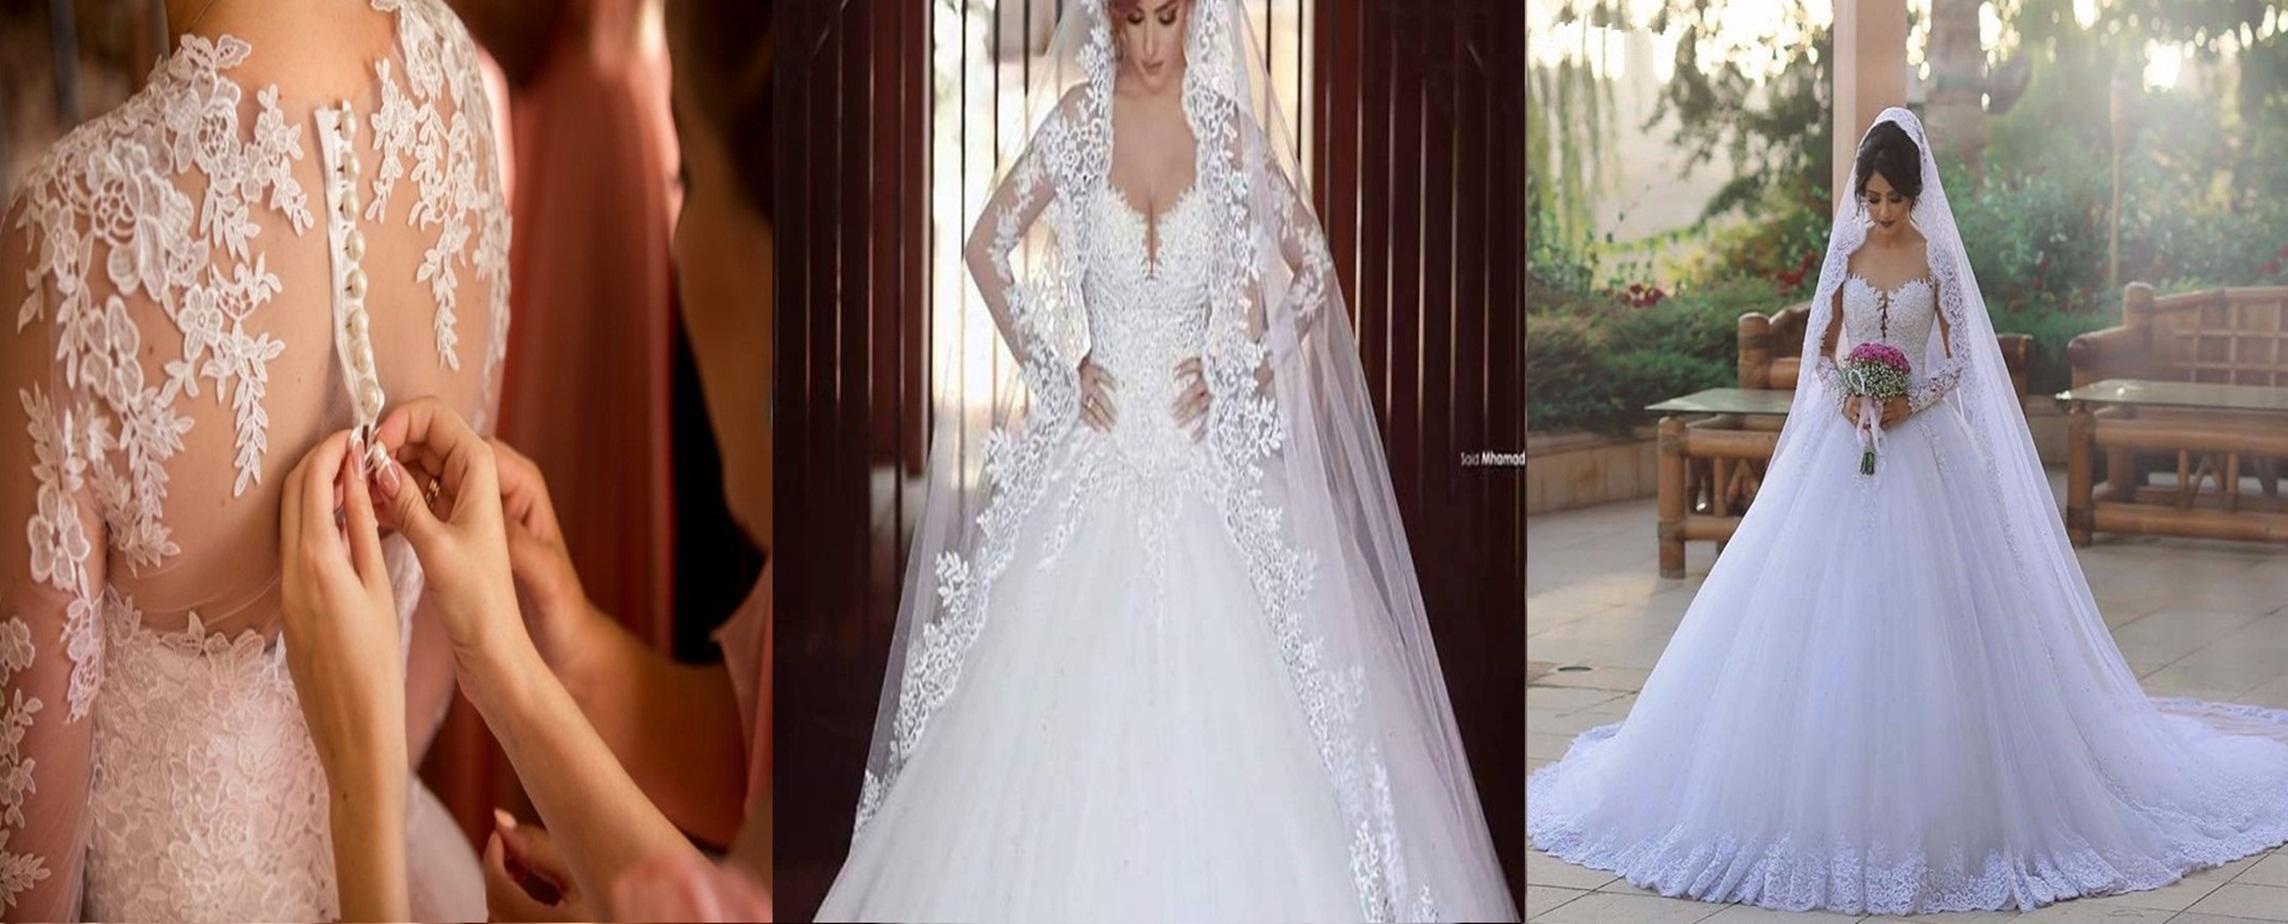 3b73c84cdf856 بالصور..كونى أميرة فى ليلة العمر بأحدث صيحات الموضة لفساتين الزفاف لــ2017